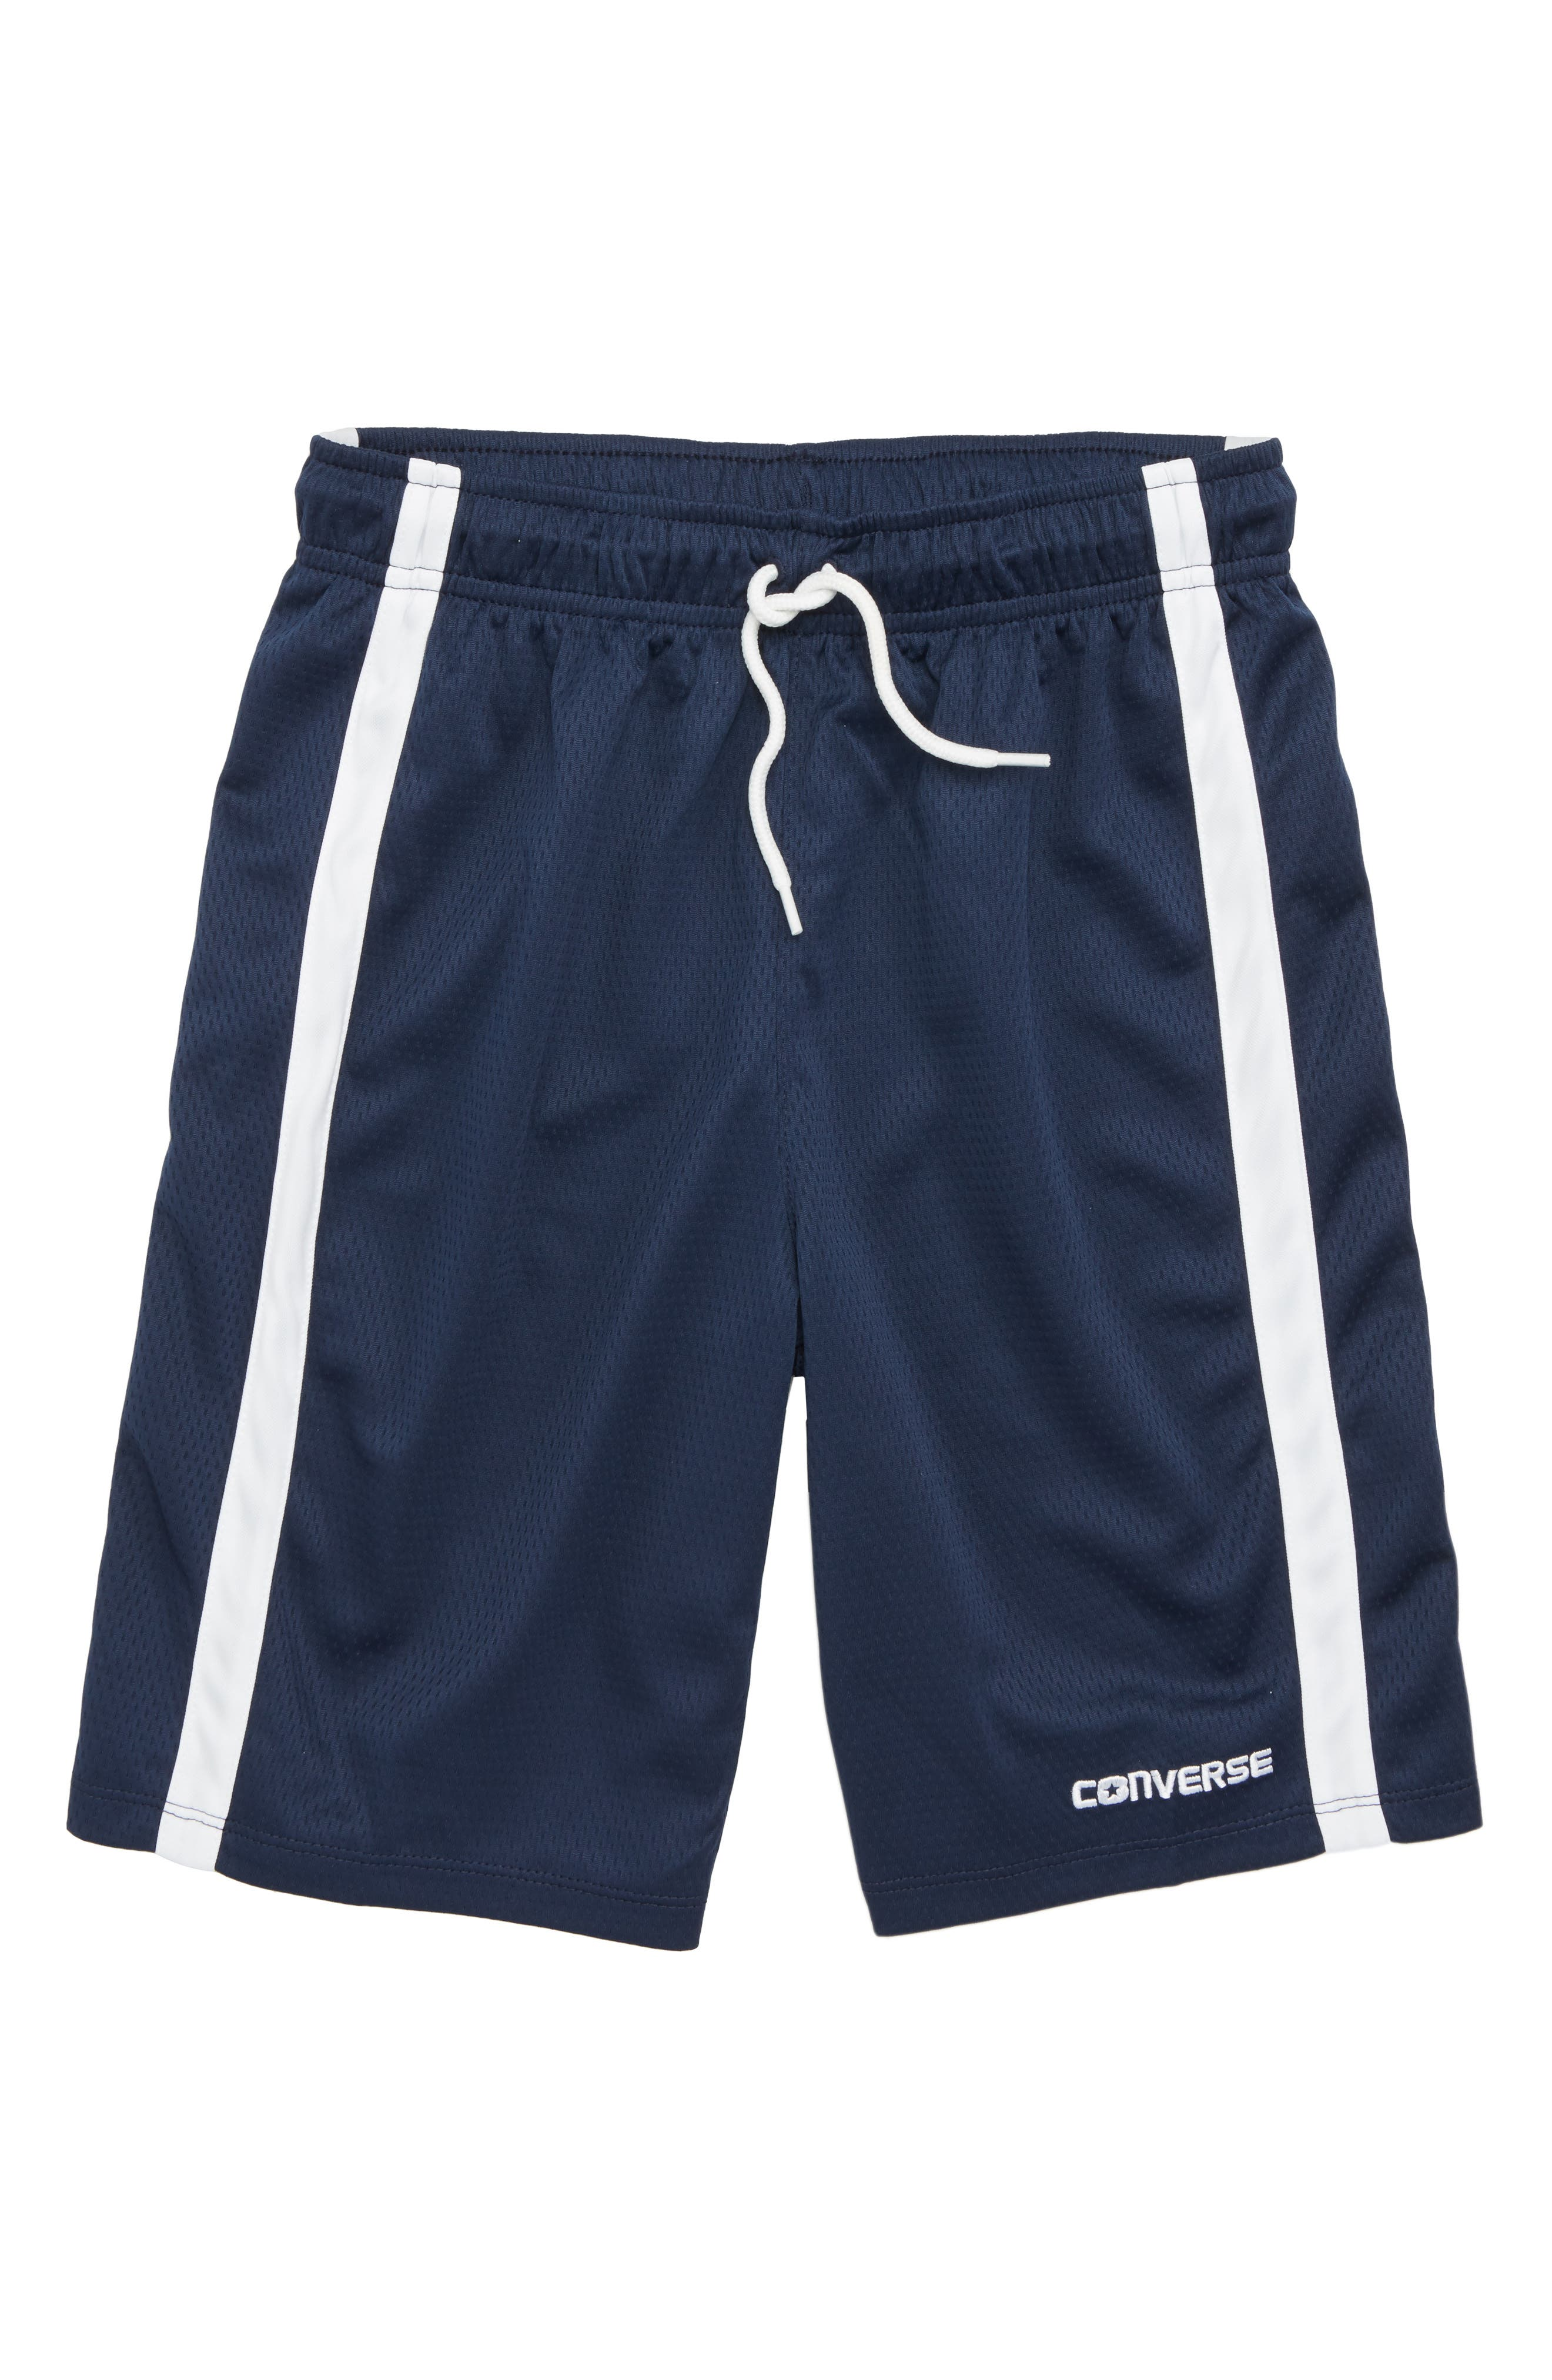 Converse Stripe Mesh Shorts (Big Boys)